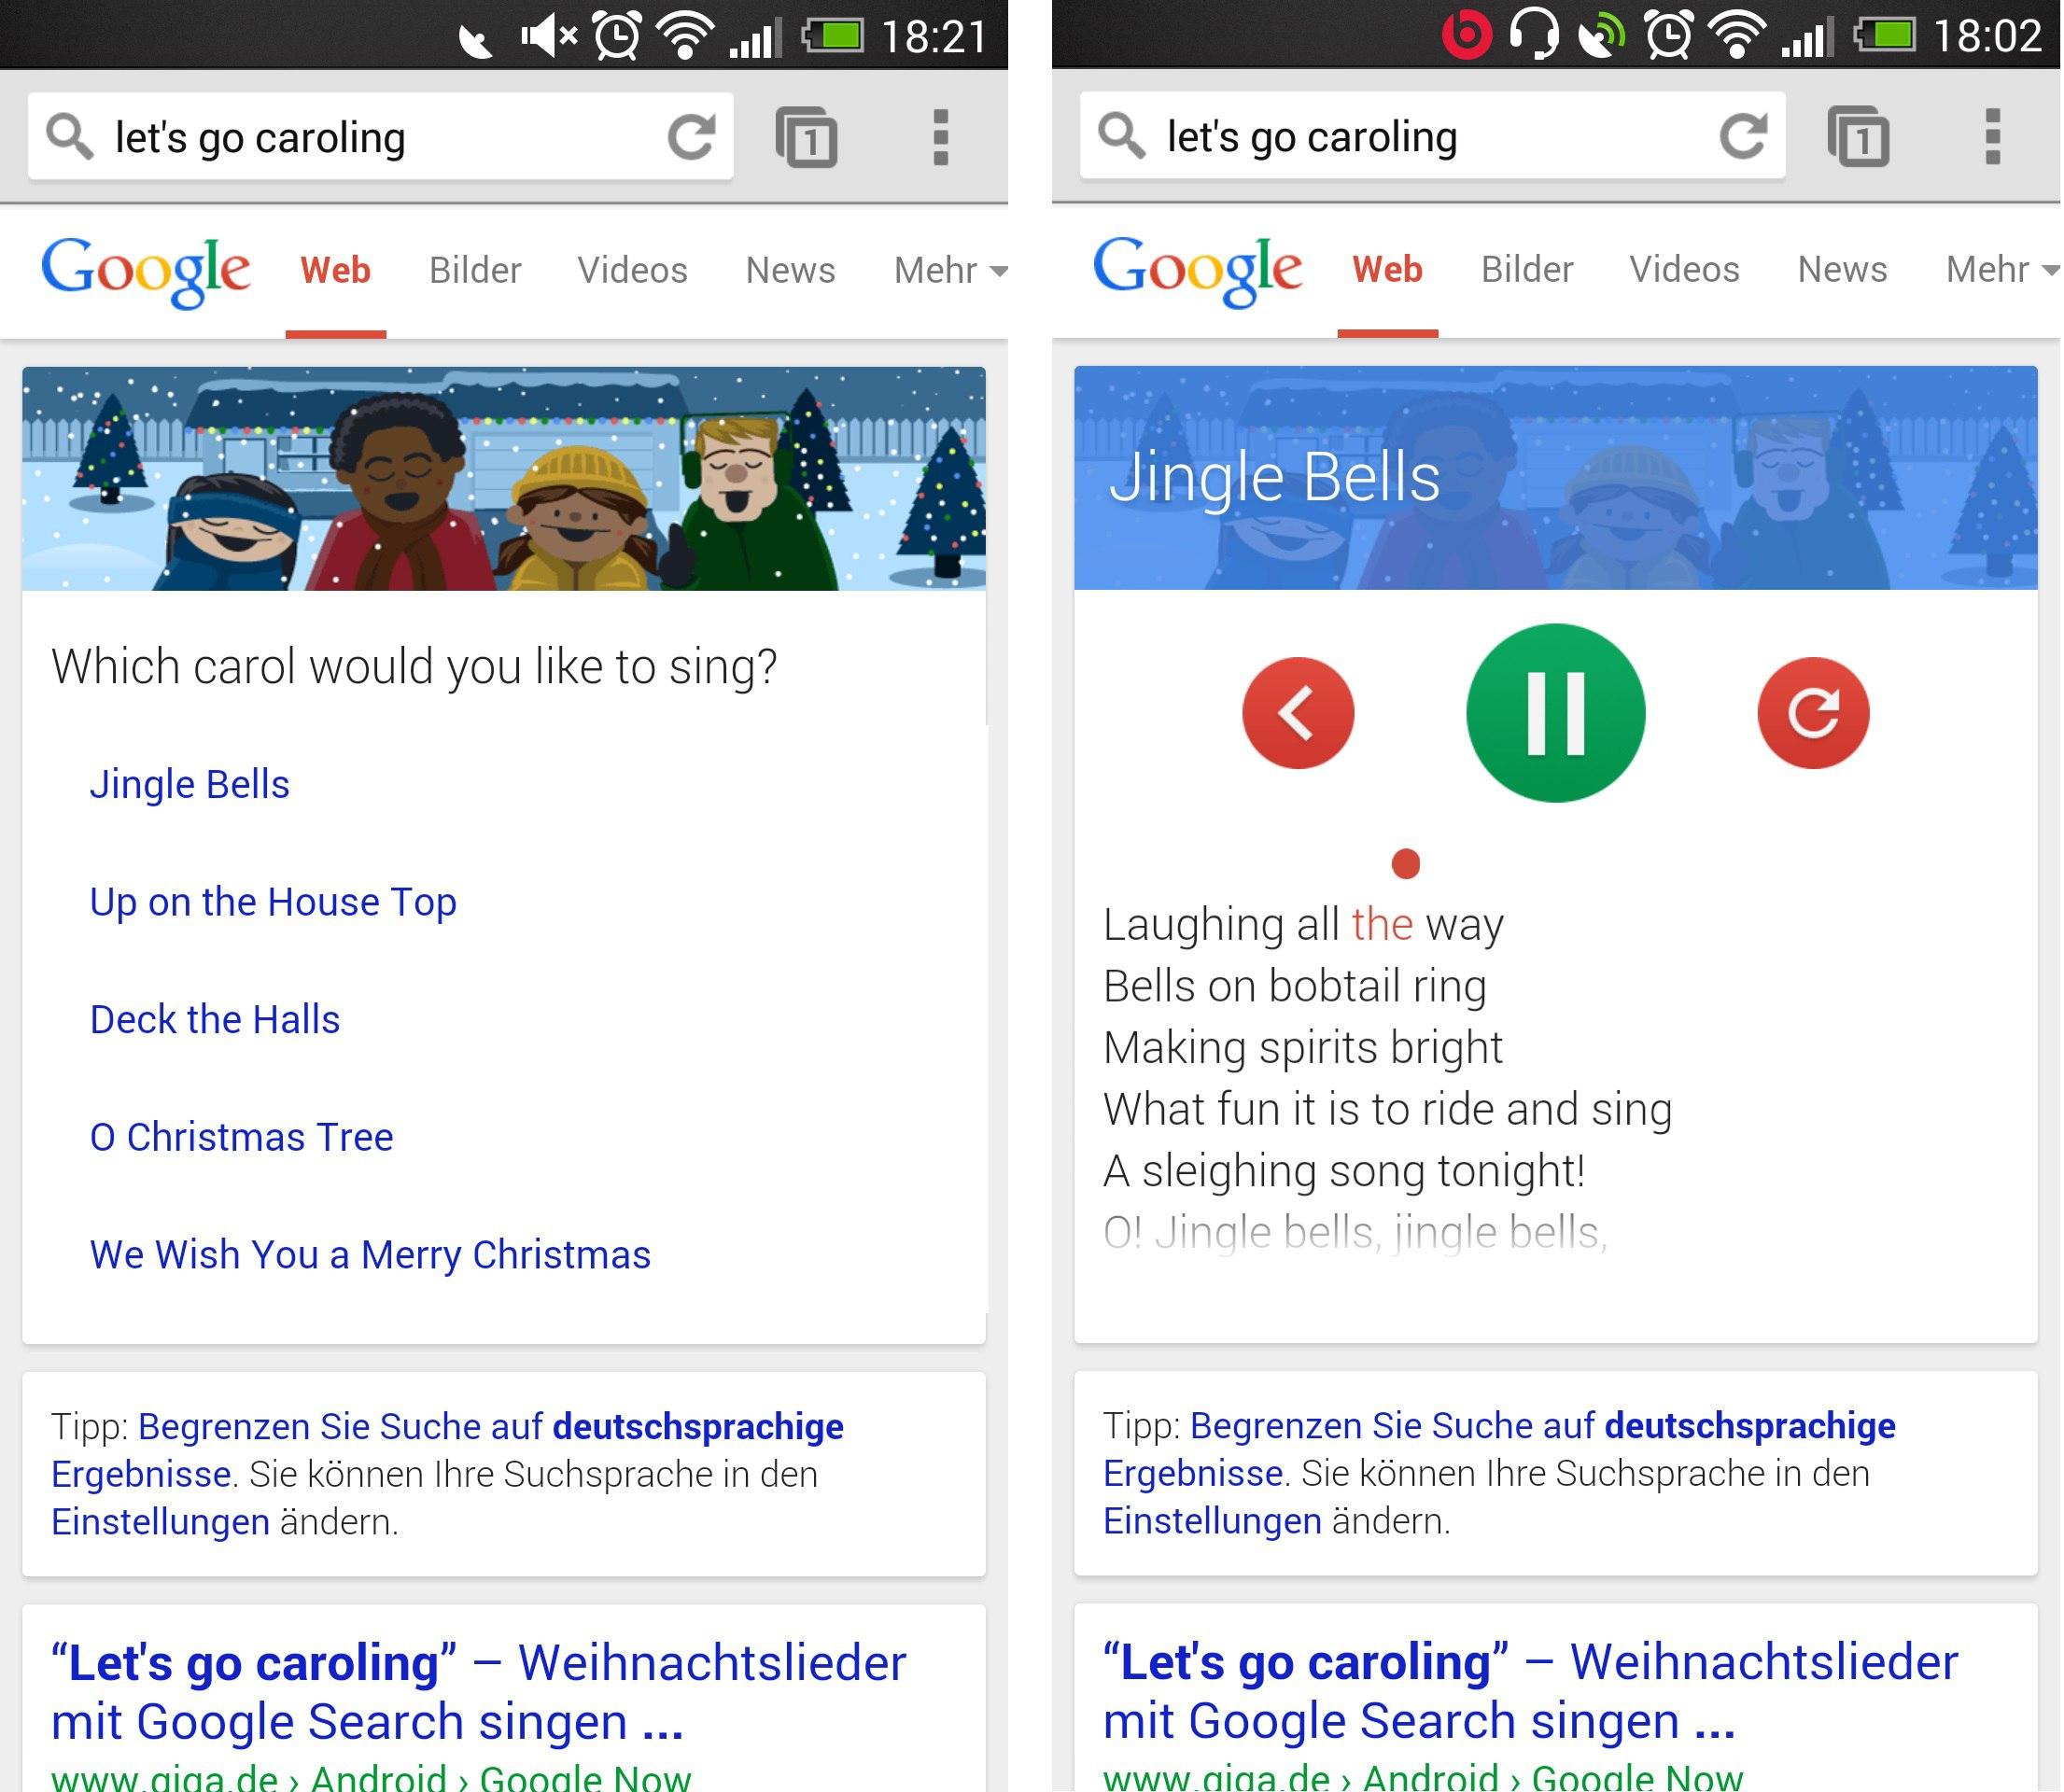 Google Easter Egg zu Weihnachten